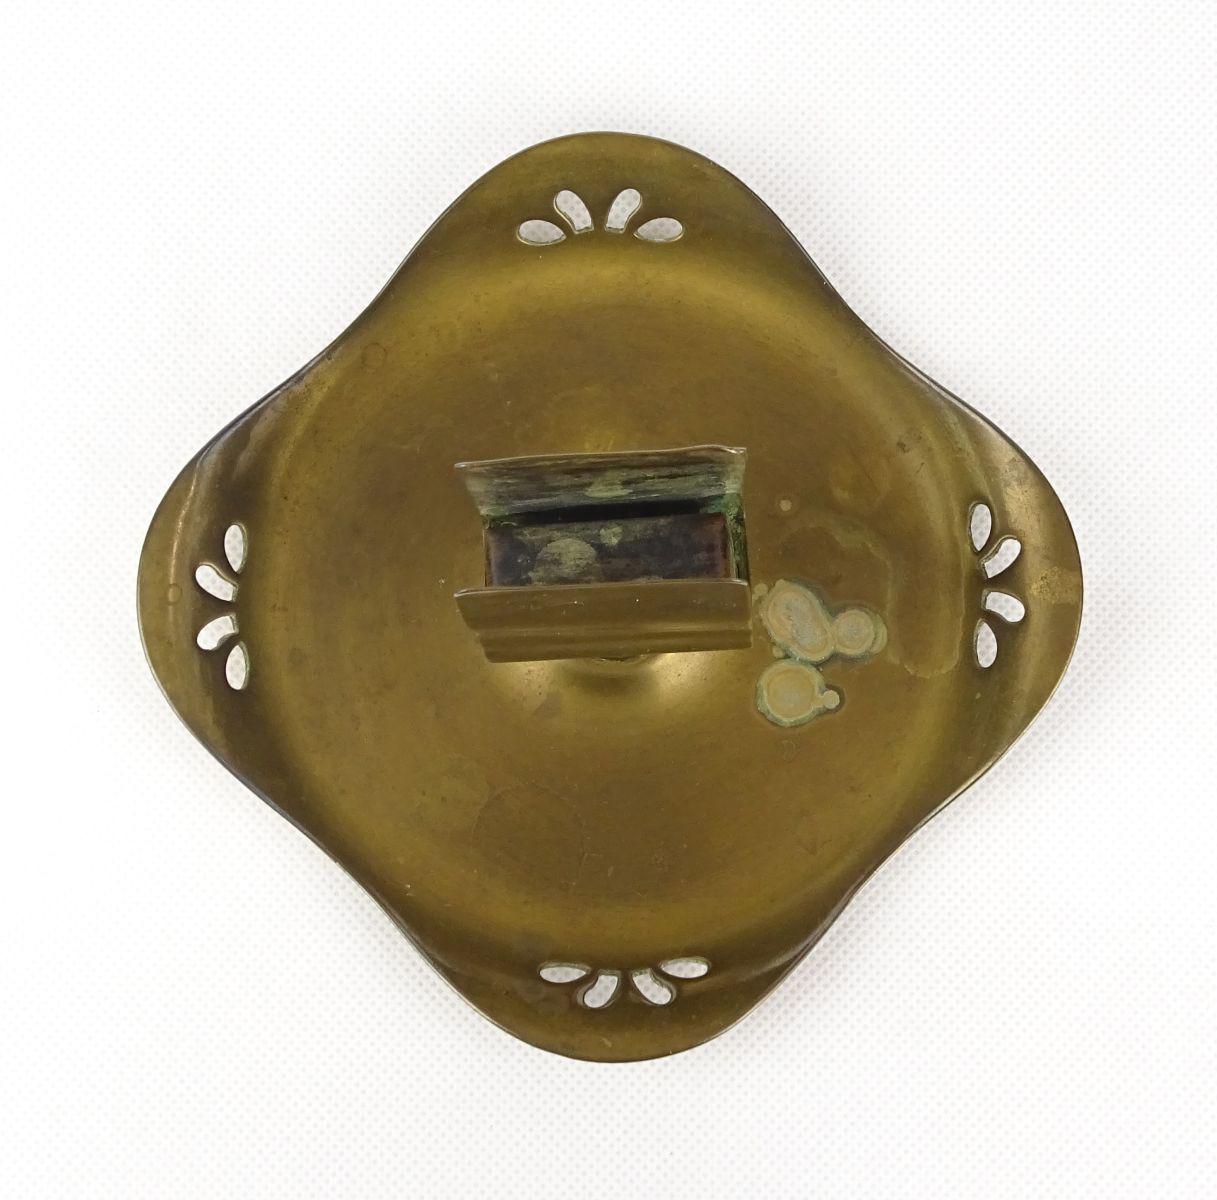 DSC08993.JPG (1217×1200)